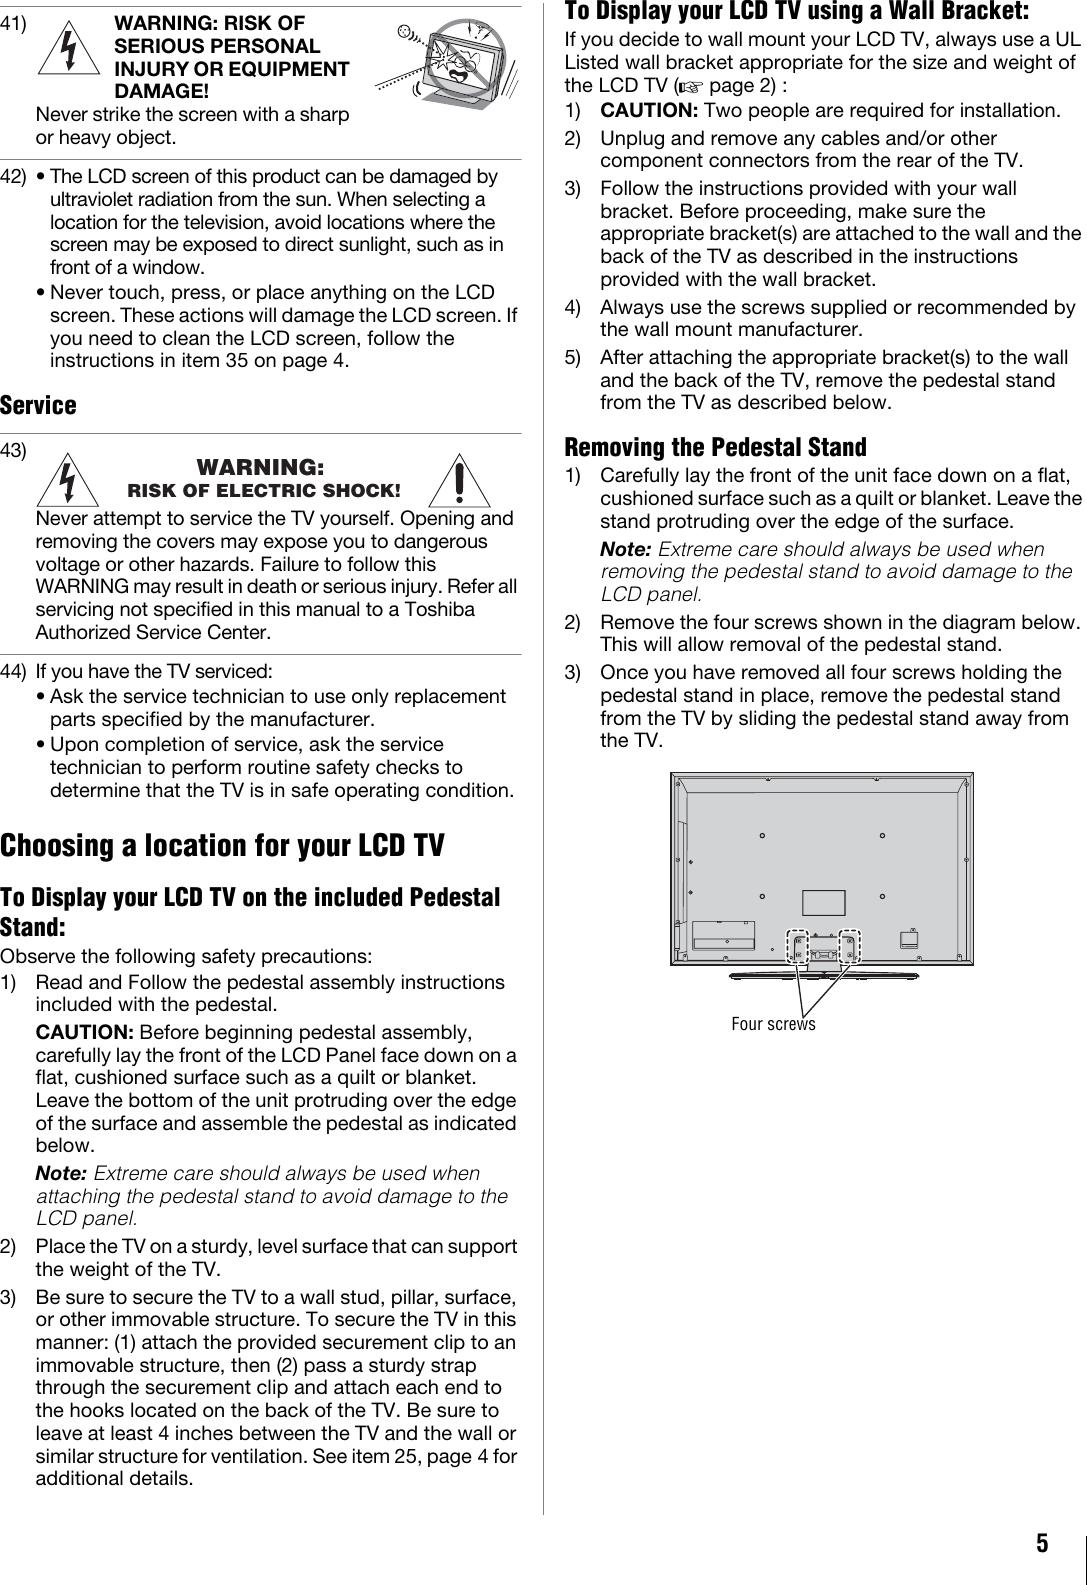 Toshiba 40Ux600U Users Manual 05240UX600